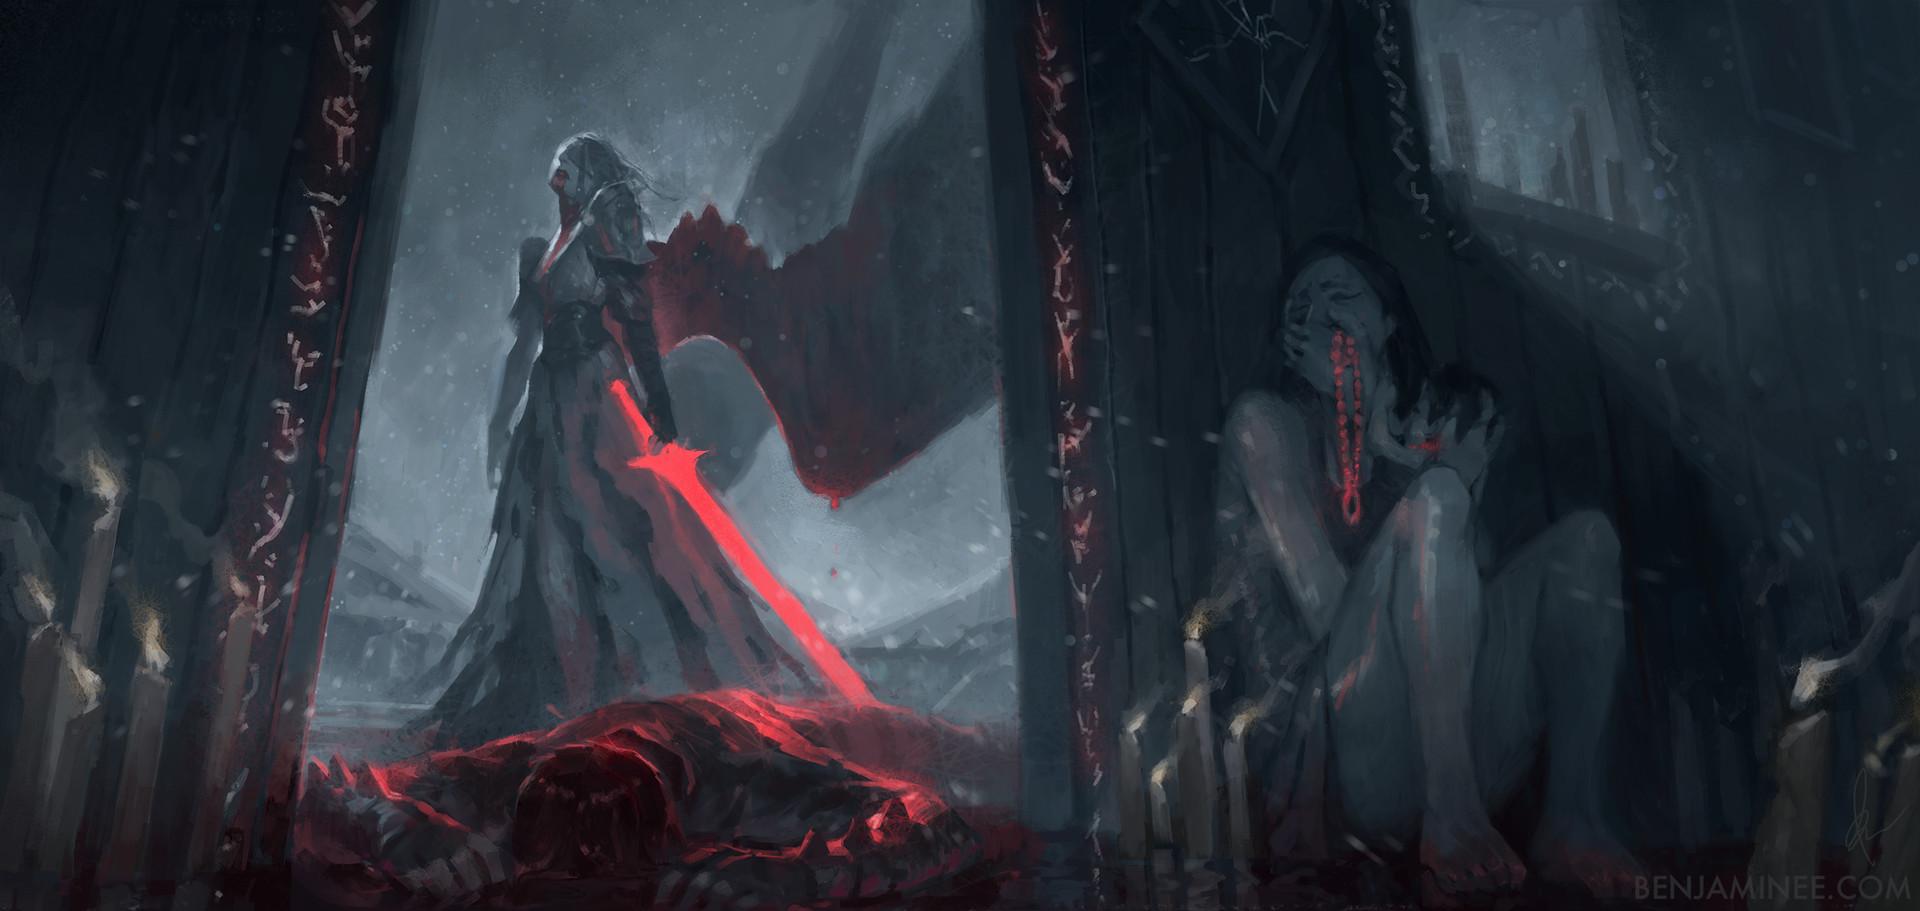 Benjamin ee angel of the bloodied dance